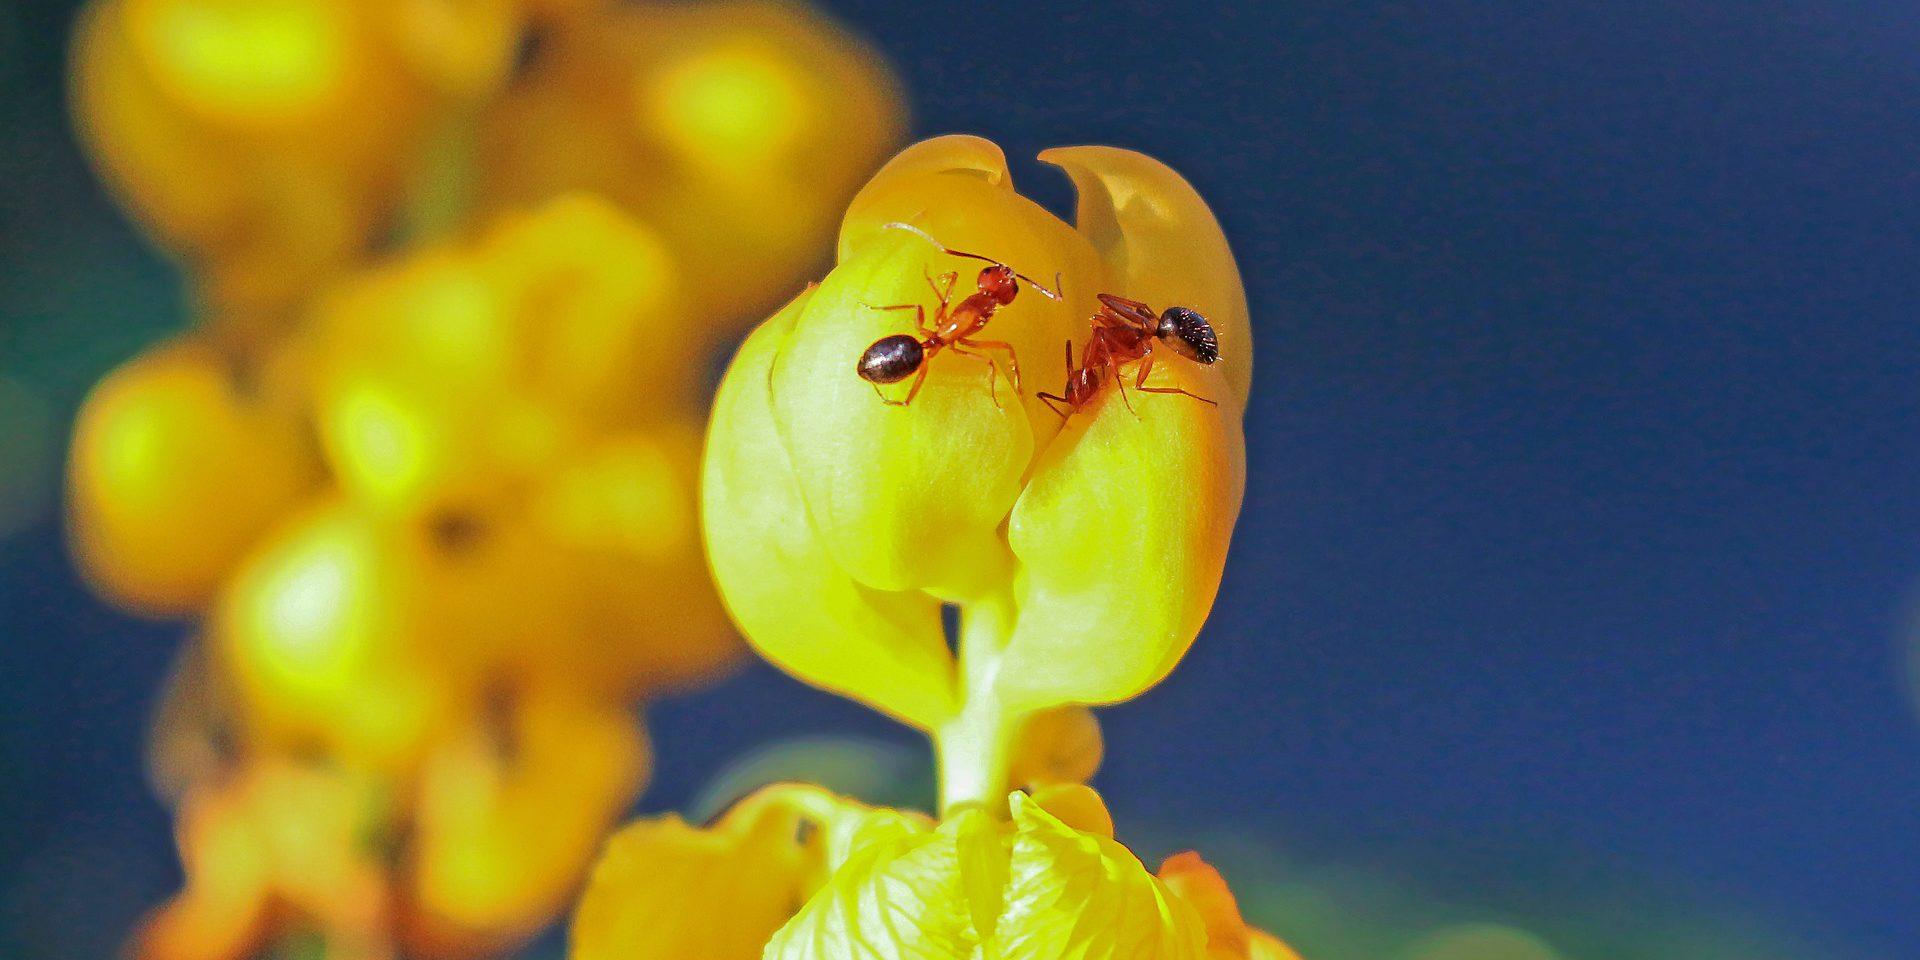 AntsFire Ants Boise fire ant control